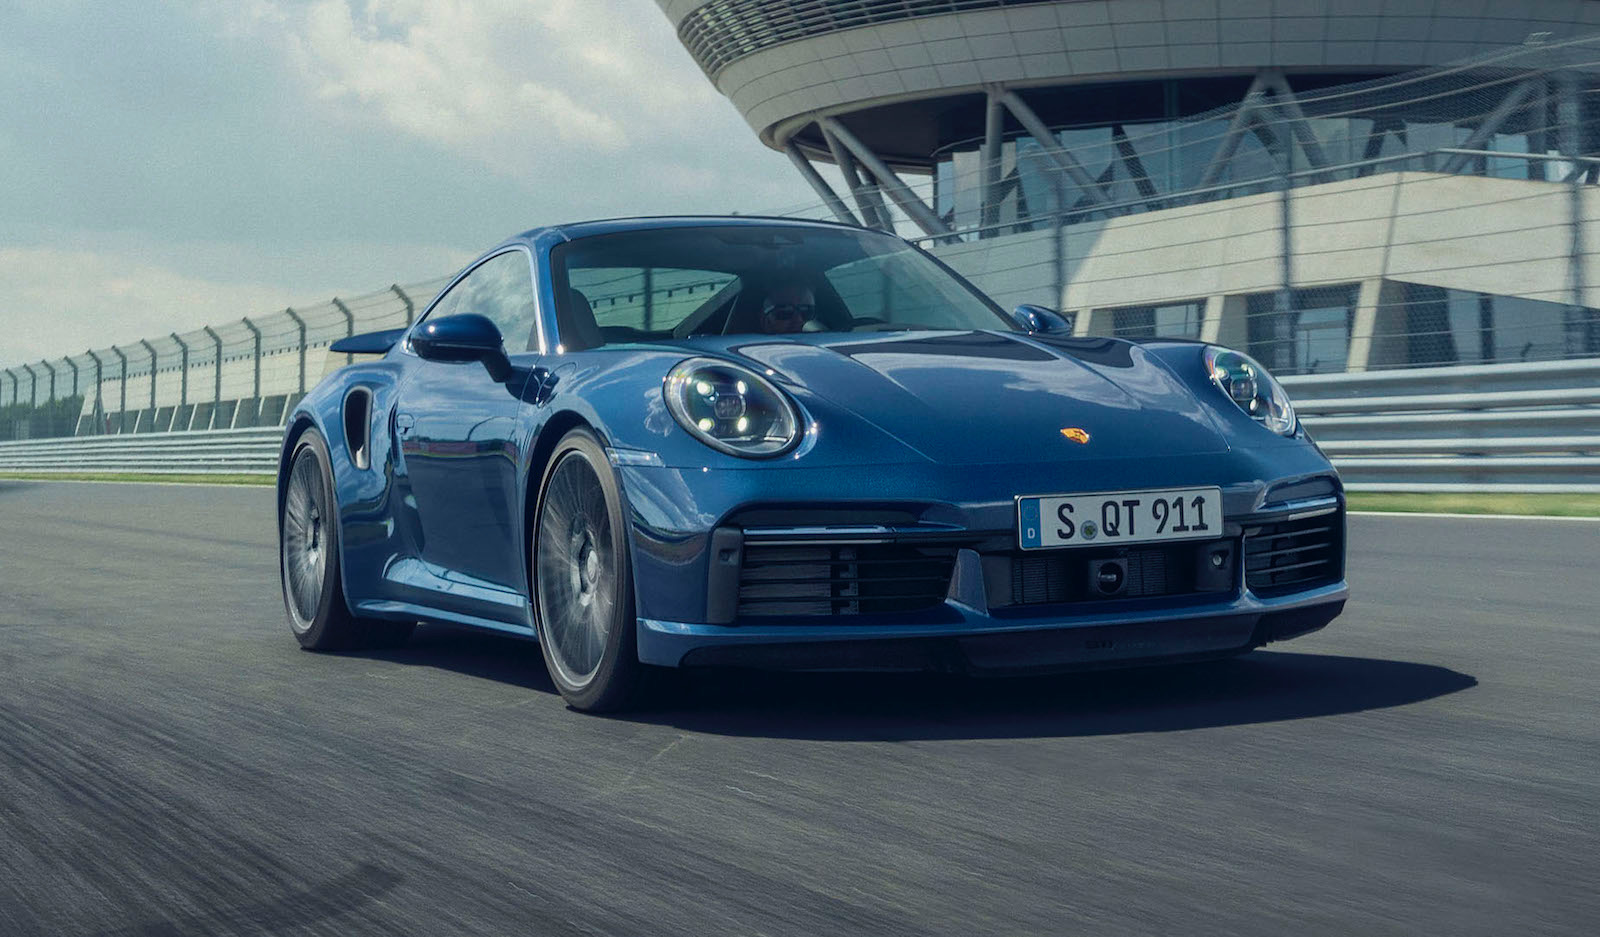 2021 Porsche 911 Turbo Revealed Sub 3 Sec 0 100km H Performancedrive